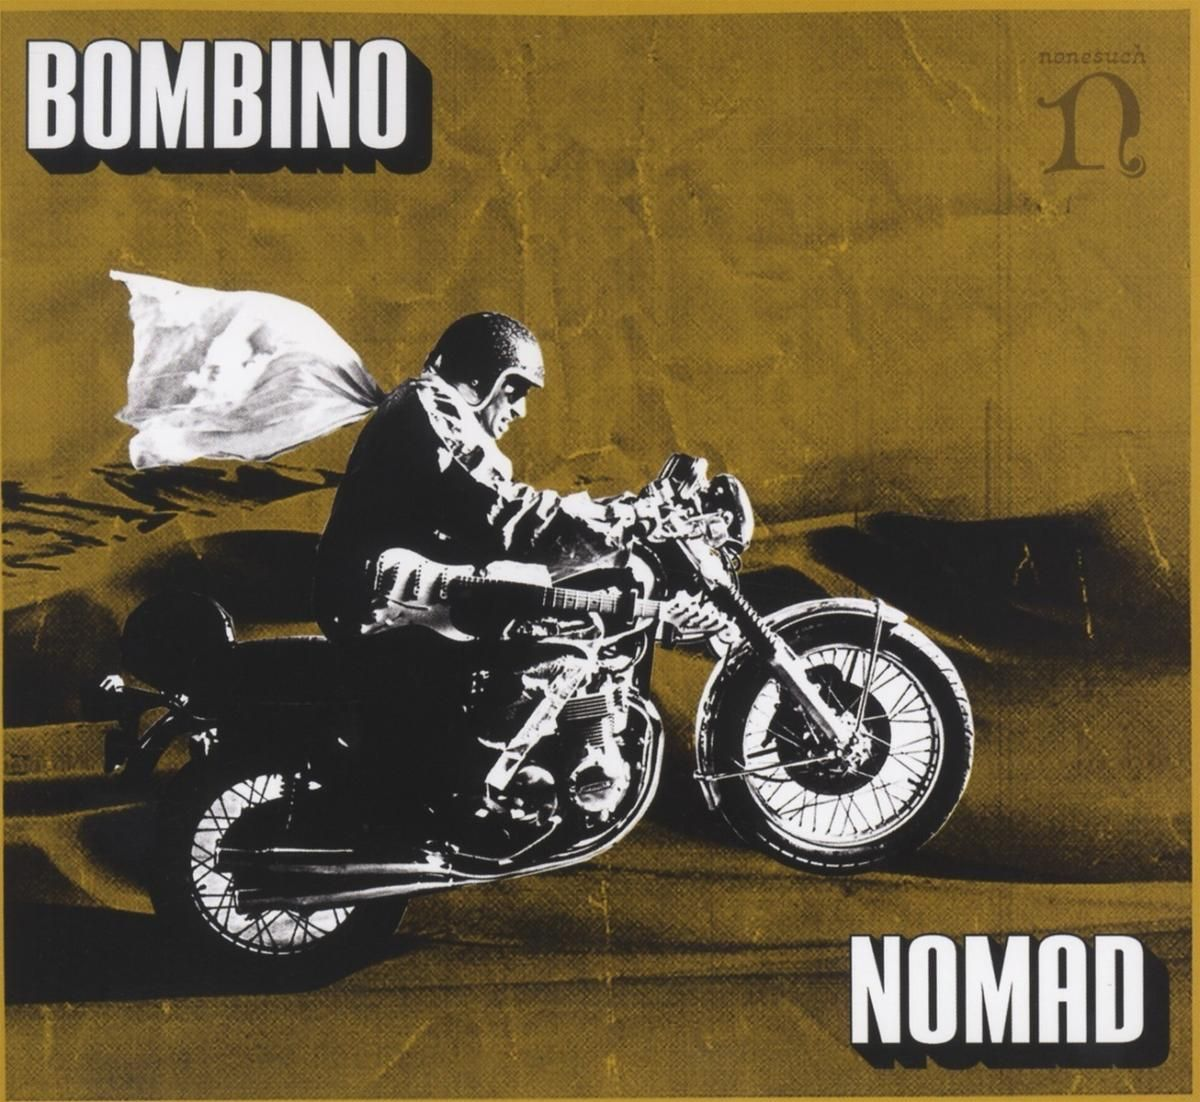 album cover art bombino nomad [04/2013] World music